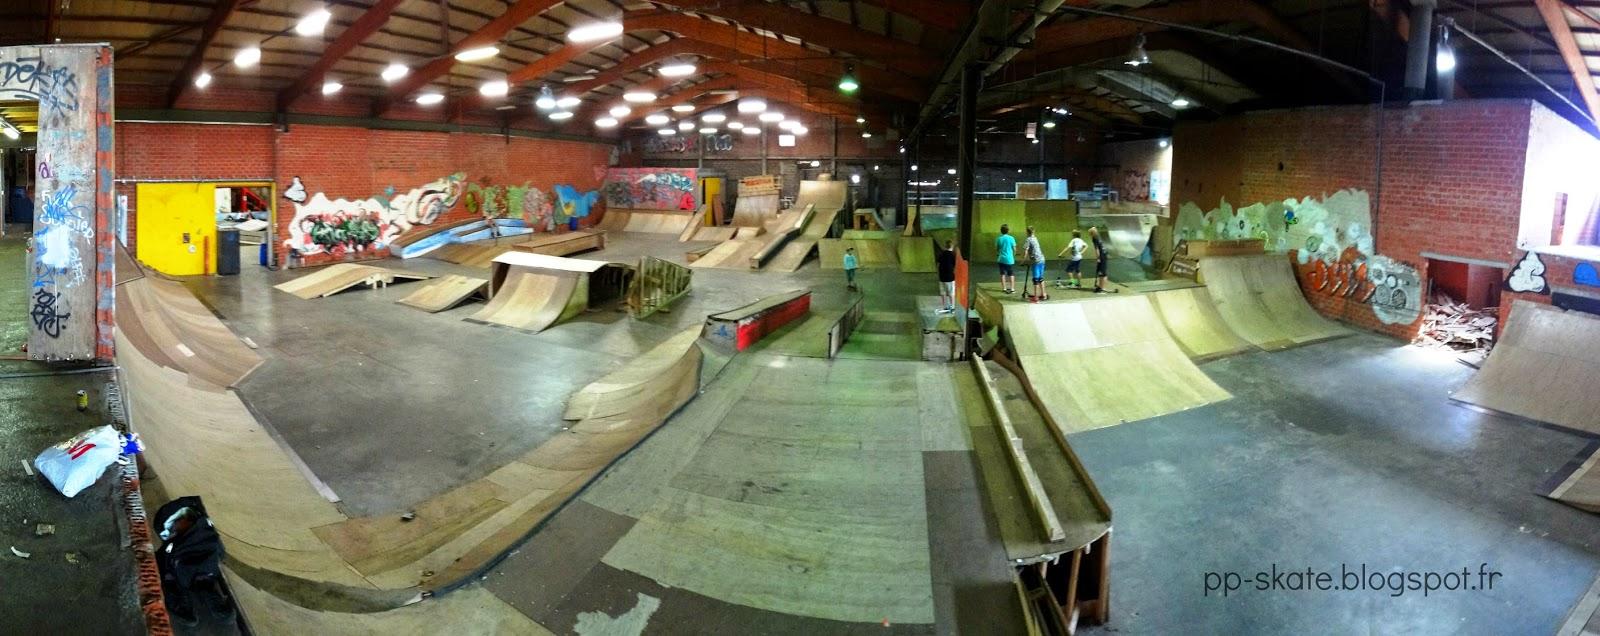 skatepark couvert roeselare